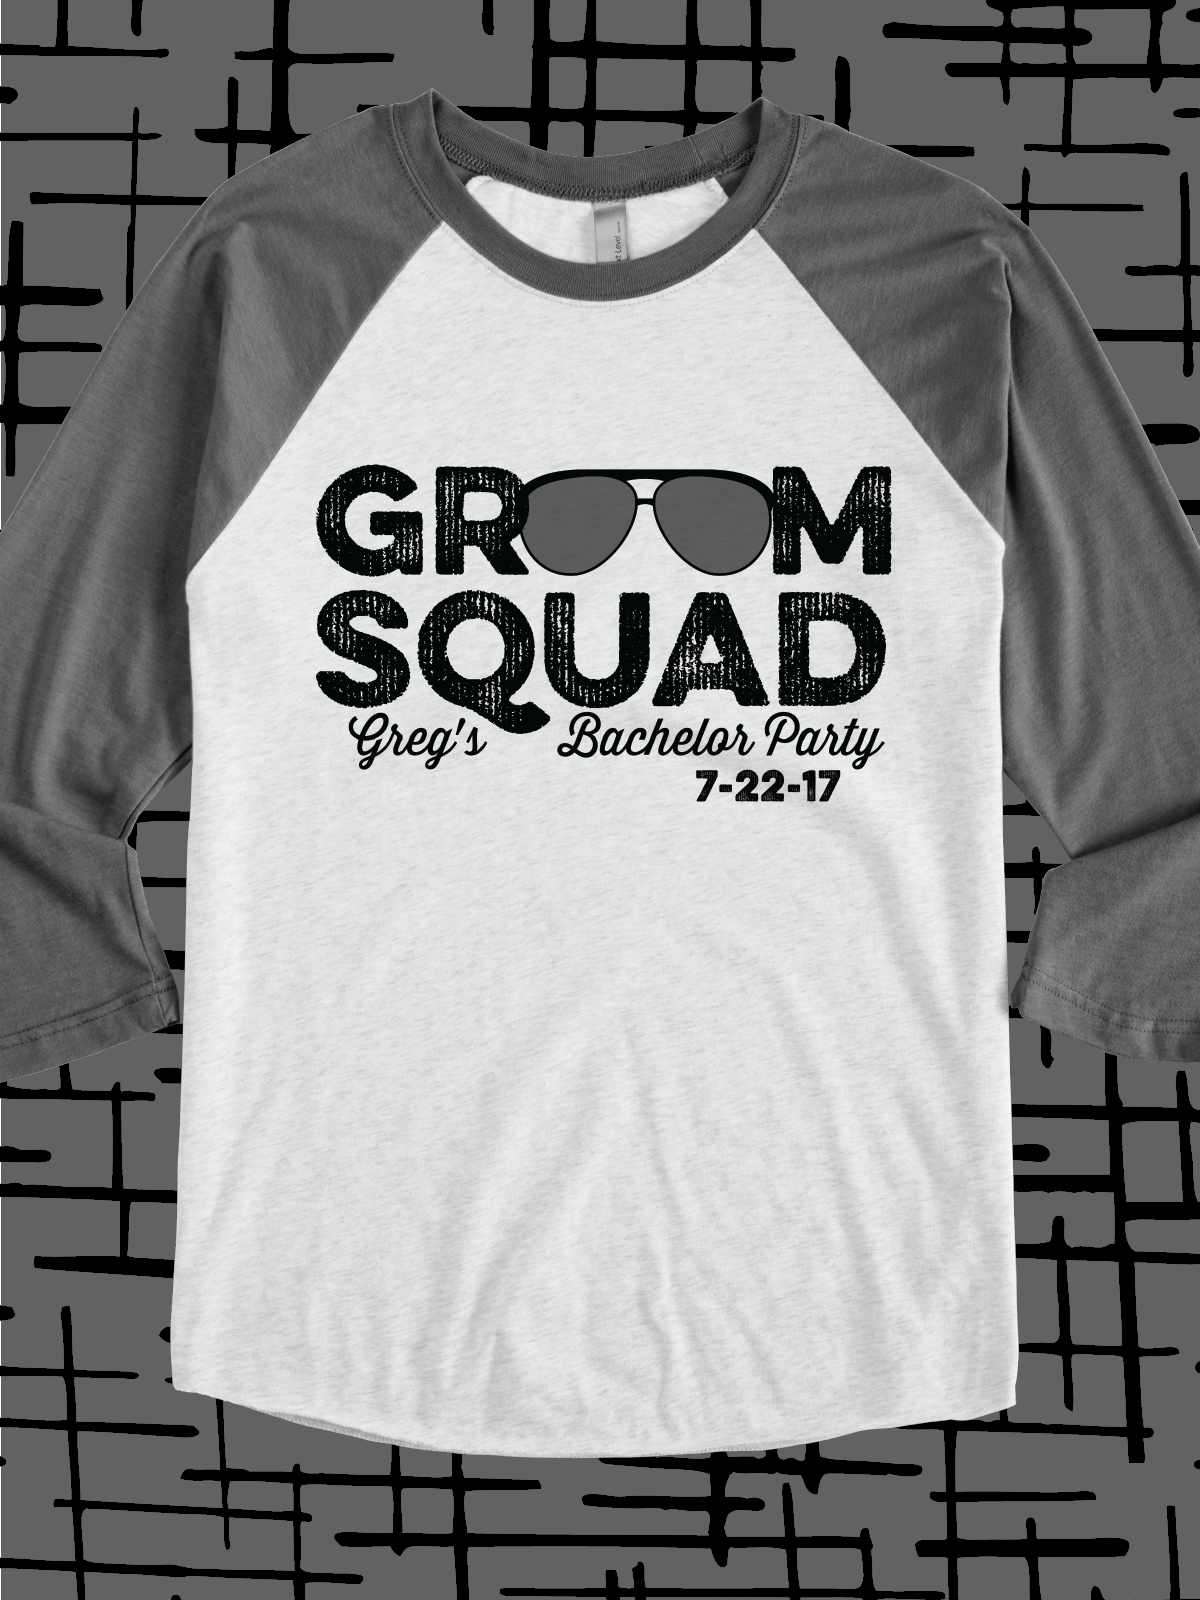 10 Ideal Bachelor Party T Shirt Ideas groom squad design idea for custom bachelor party t shirts raglans 2020